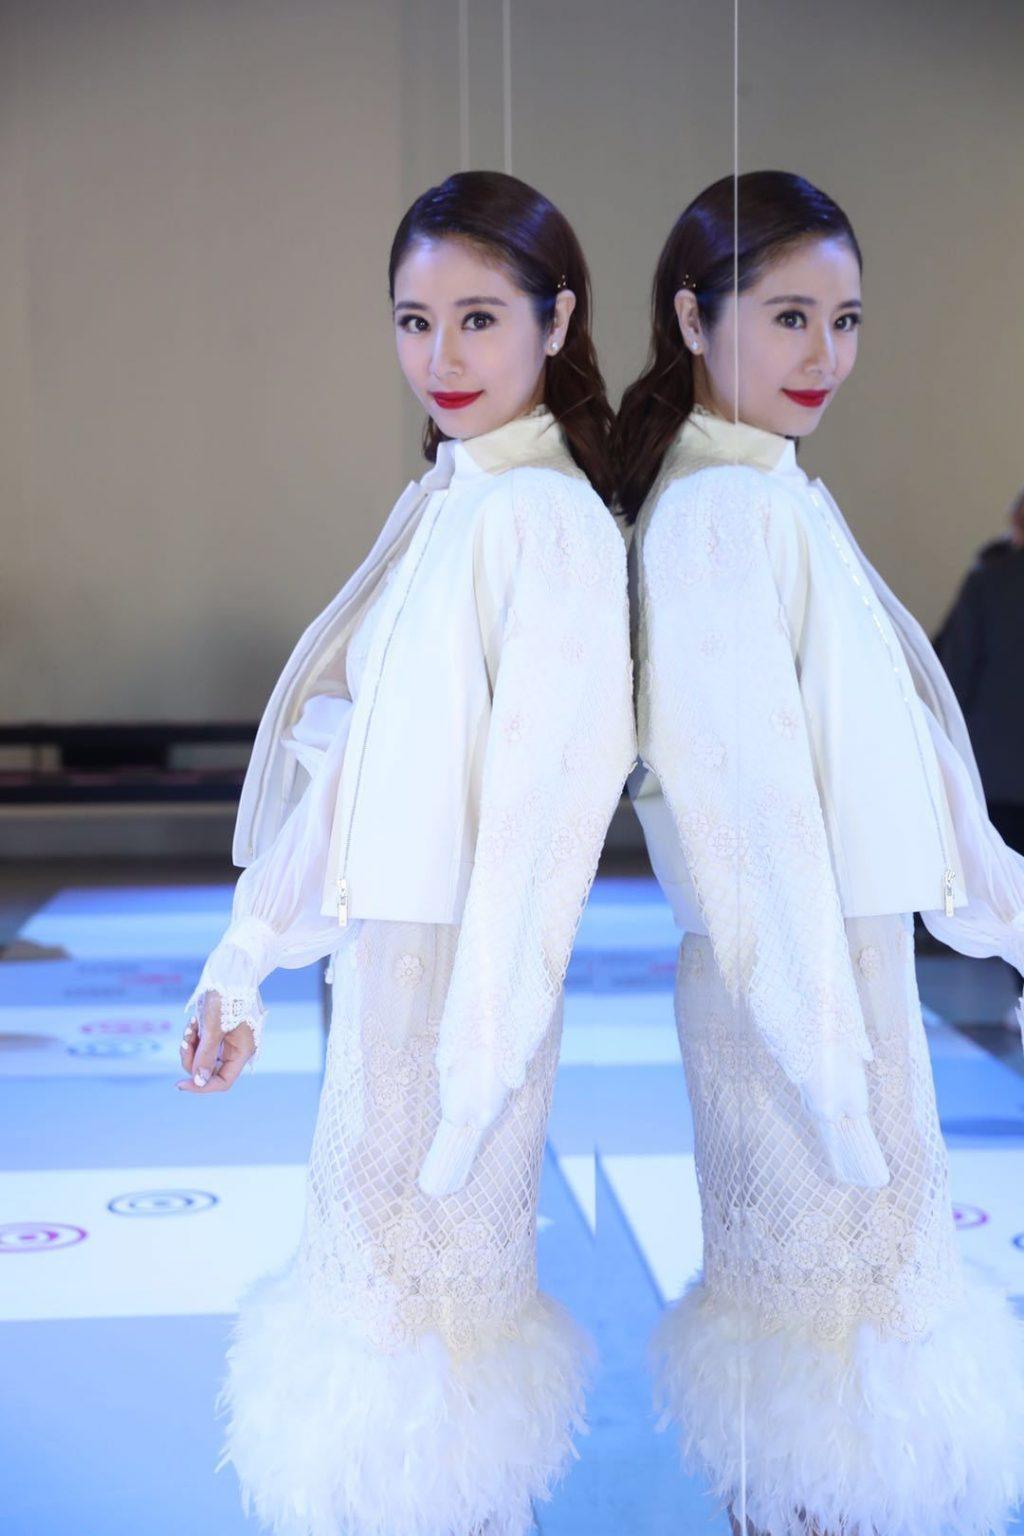 sao quốc tế tại tuần lễ thời trang paris 2019 25